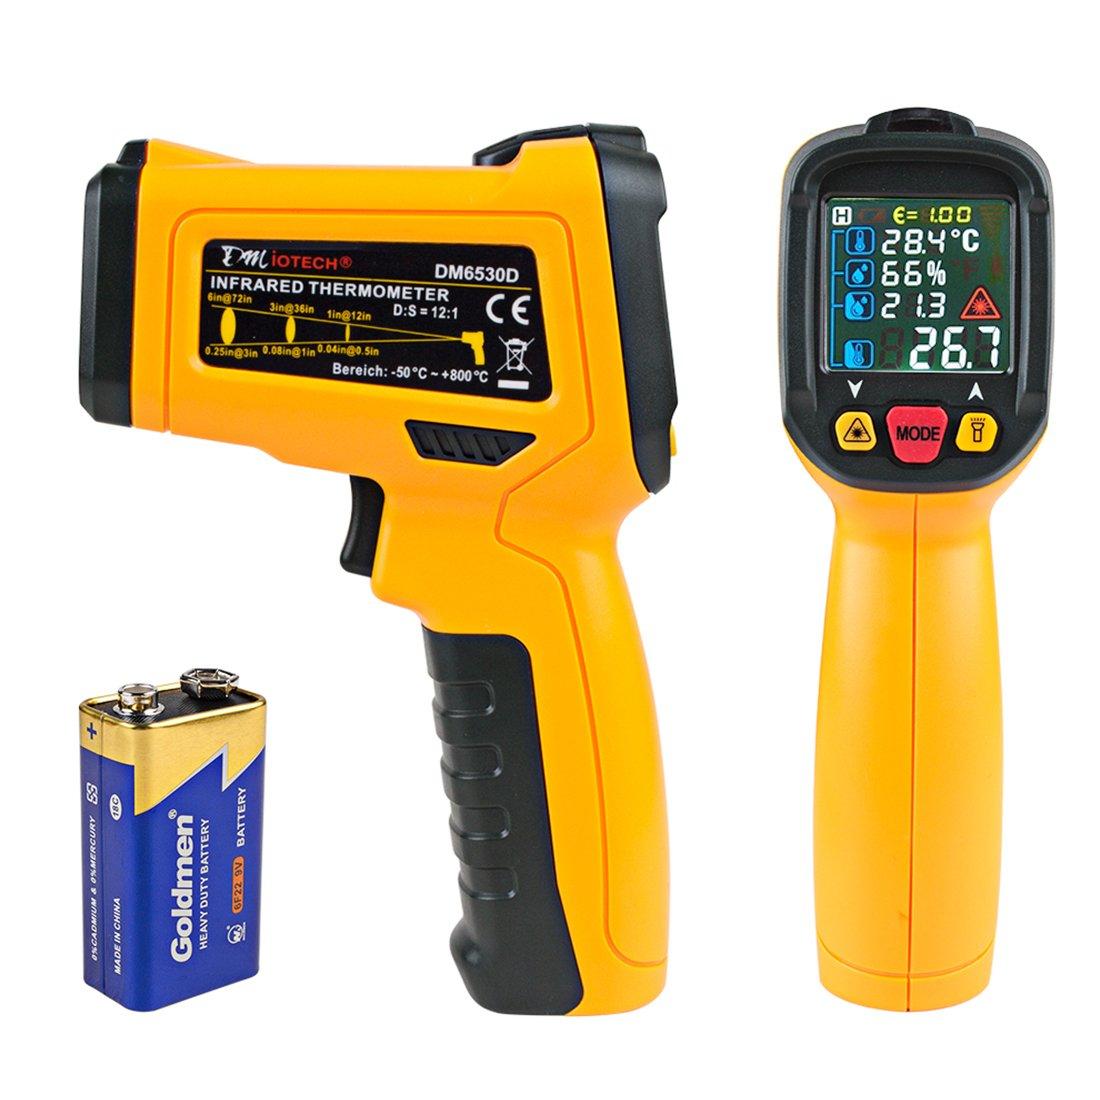 uxcell Temperature Gun Non-Contact Digital Laser Infrared Thermometer GUN -58-1472 Fahrenheit (-50-800 Celsius) Temp Handheld Yellow Black